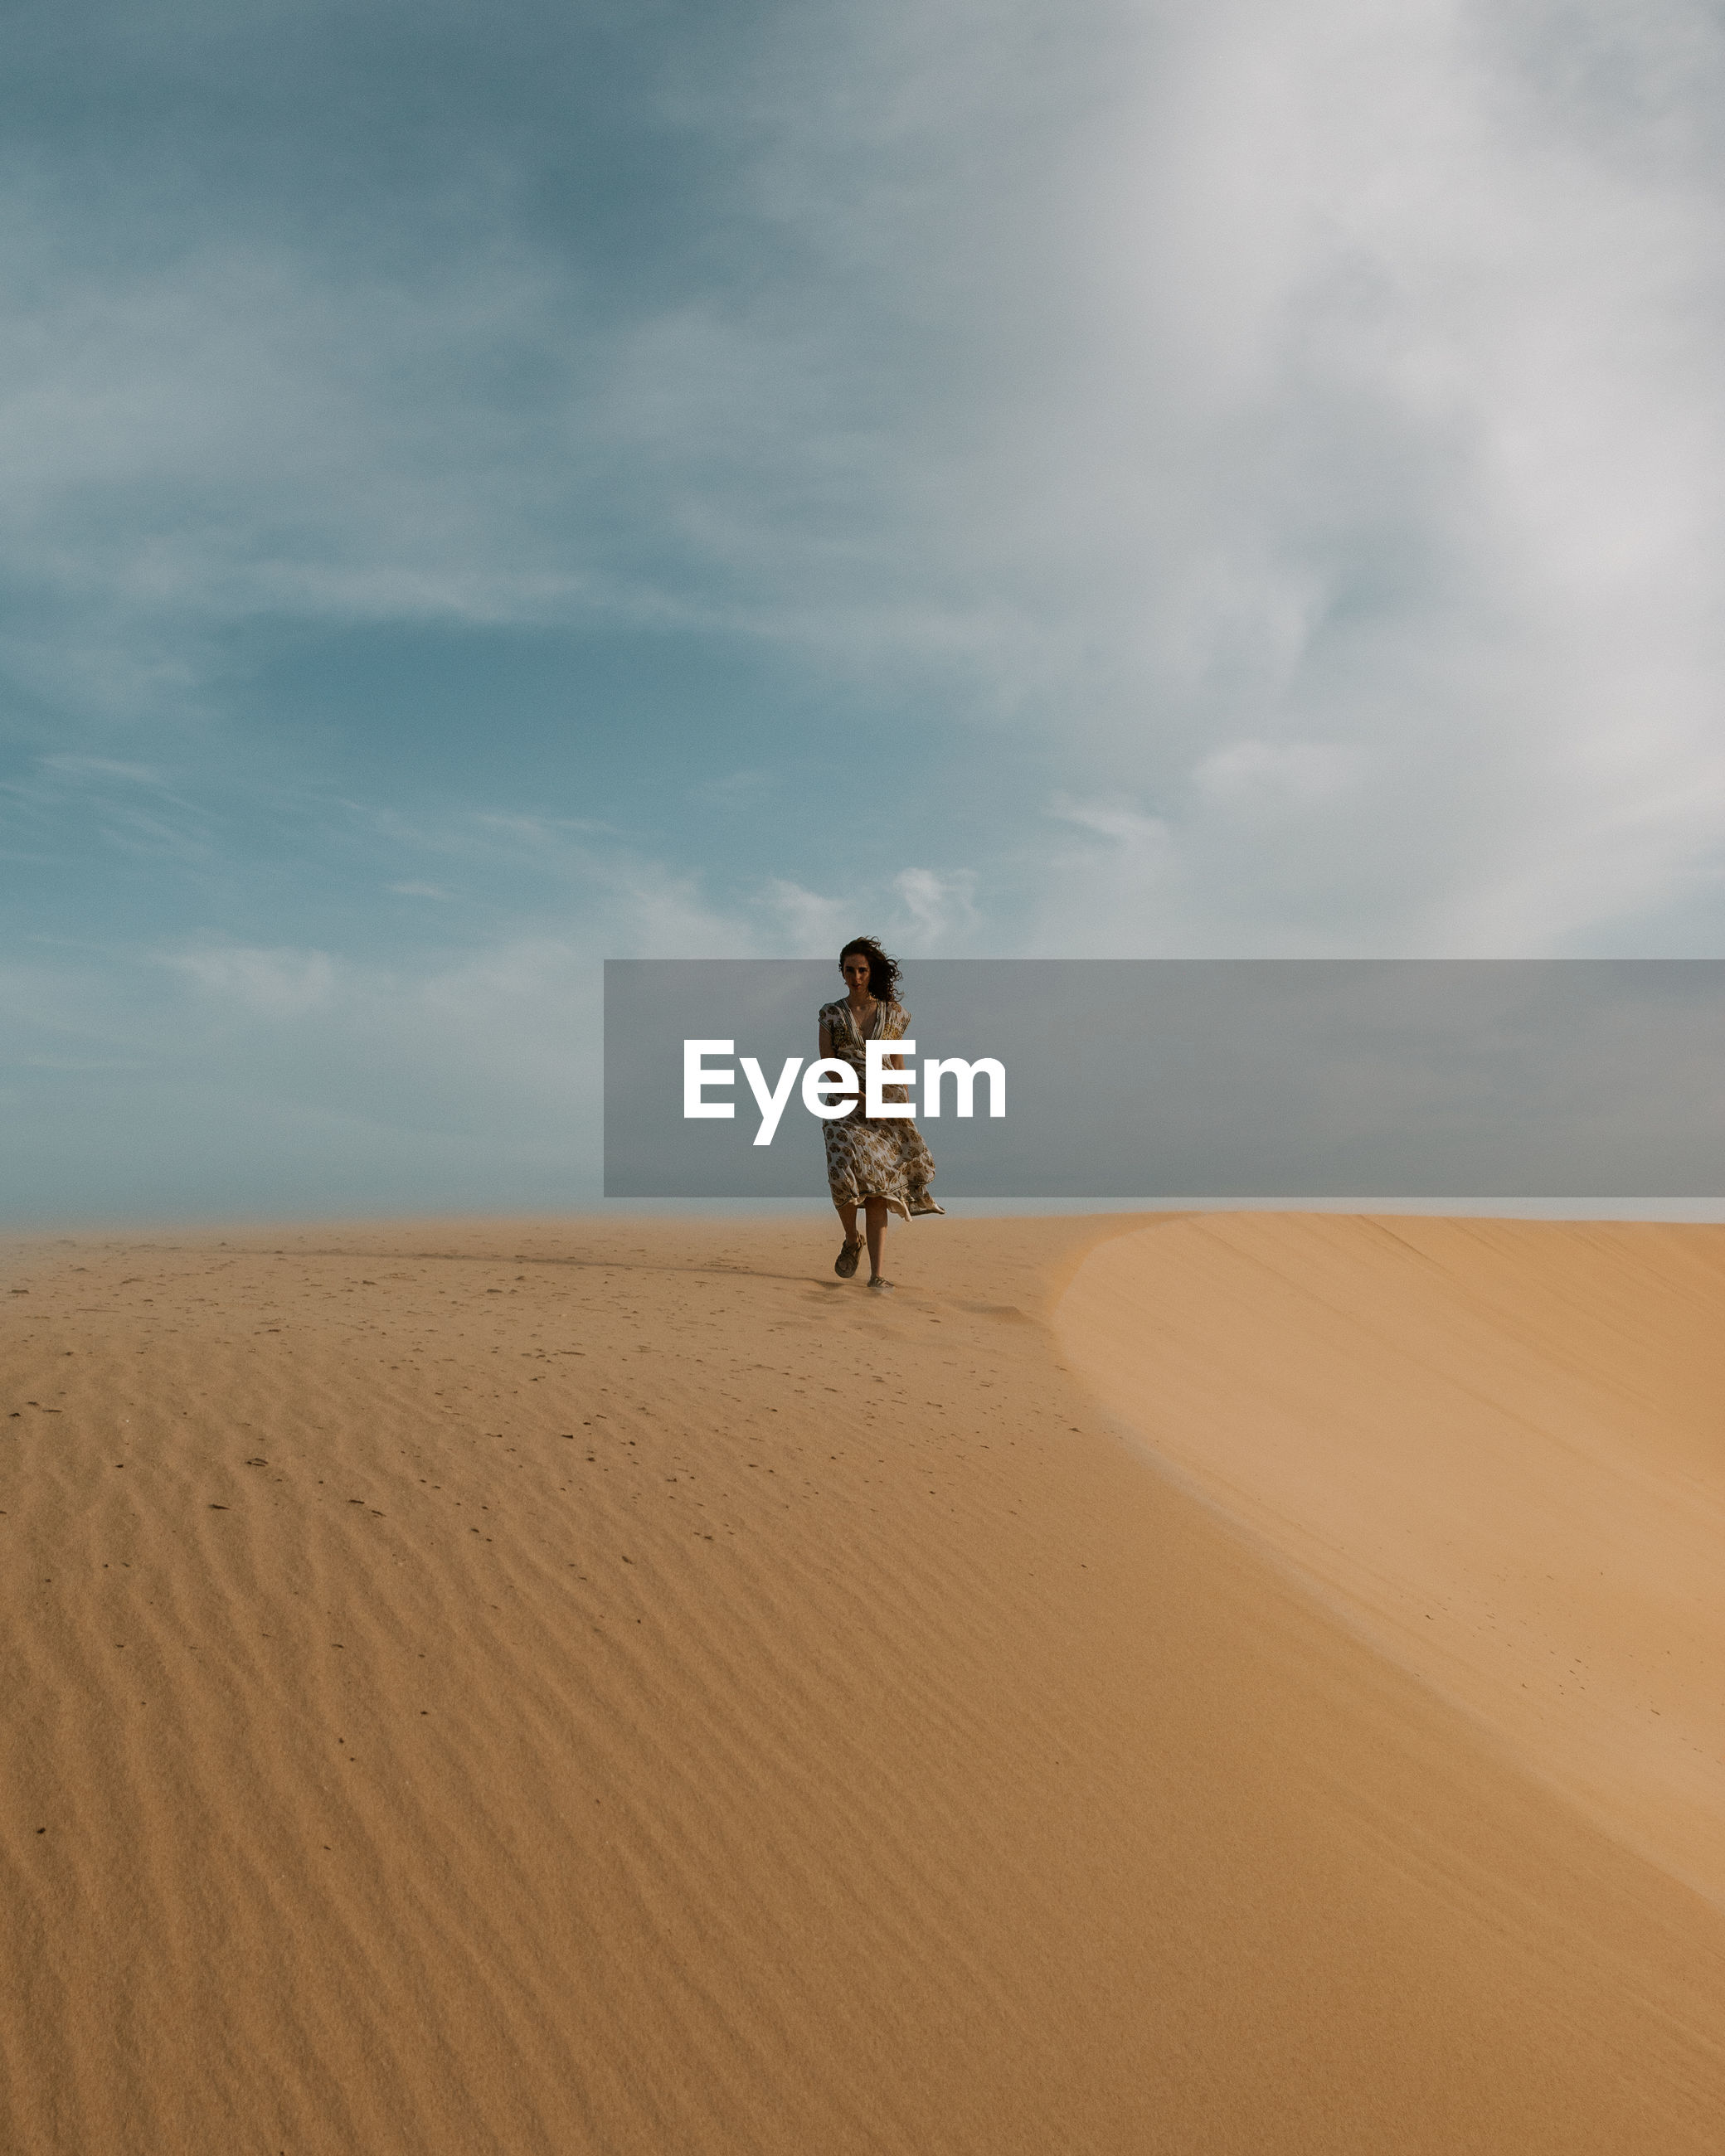 Woman standing on a sand dune in desert against sky